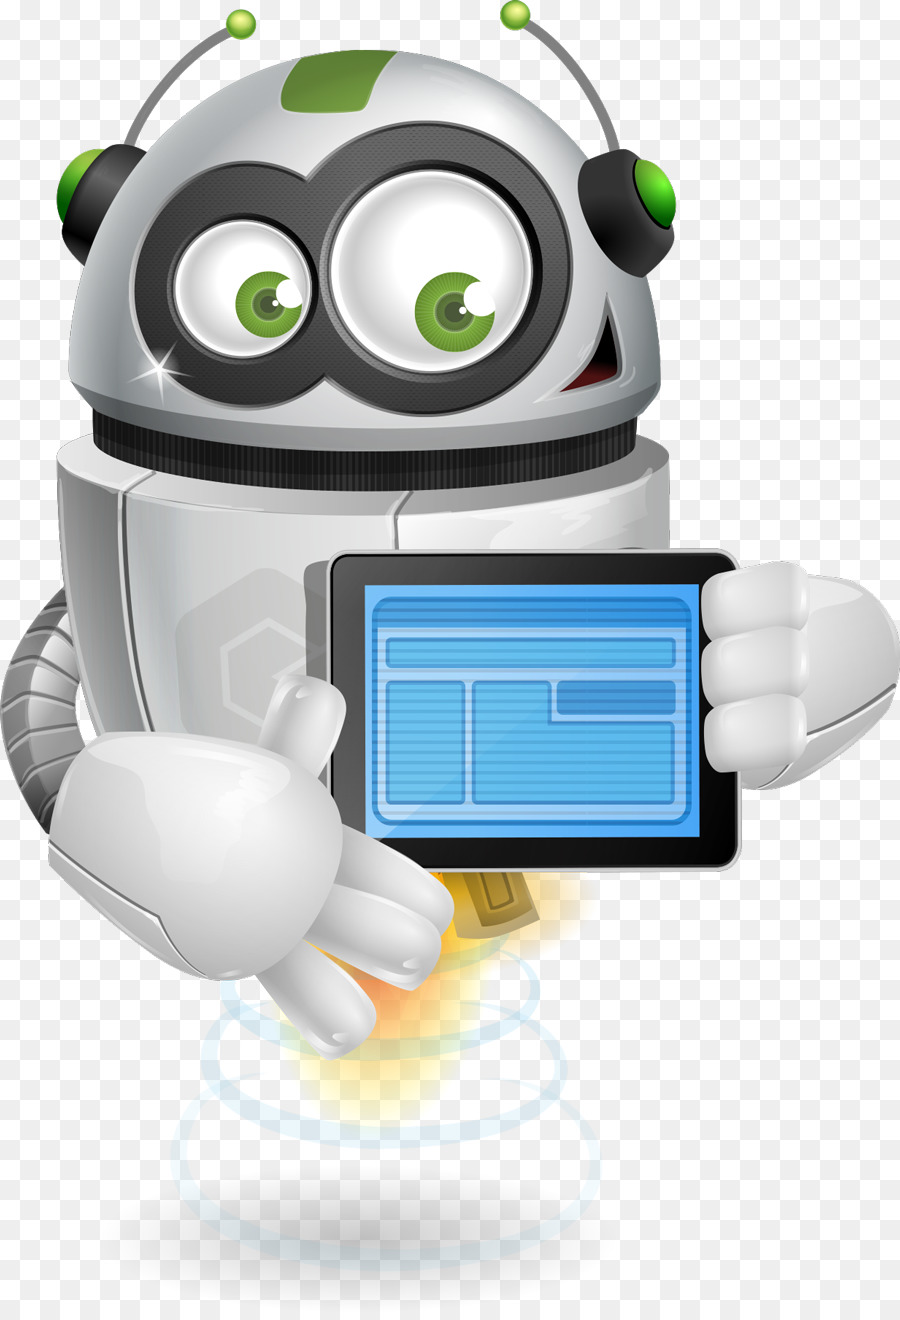 1 robot opsi biner online dan perdagangan yoshida